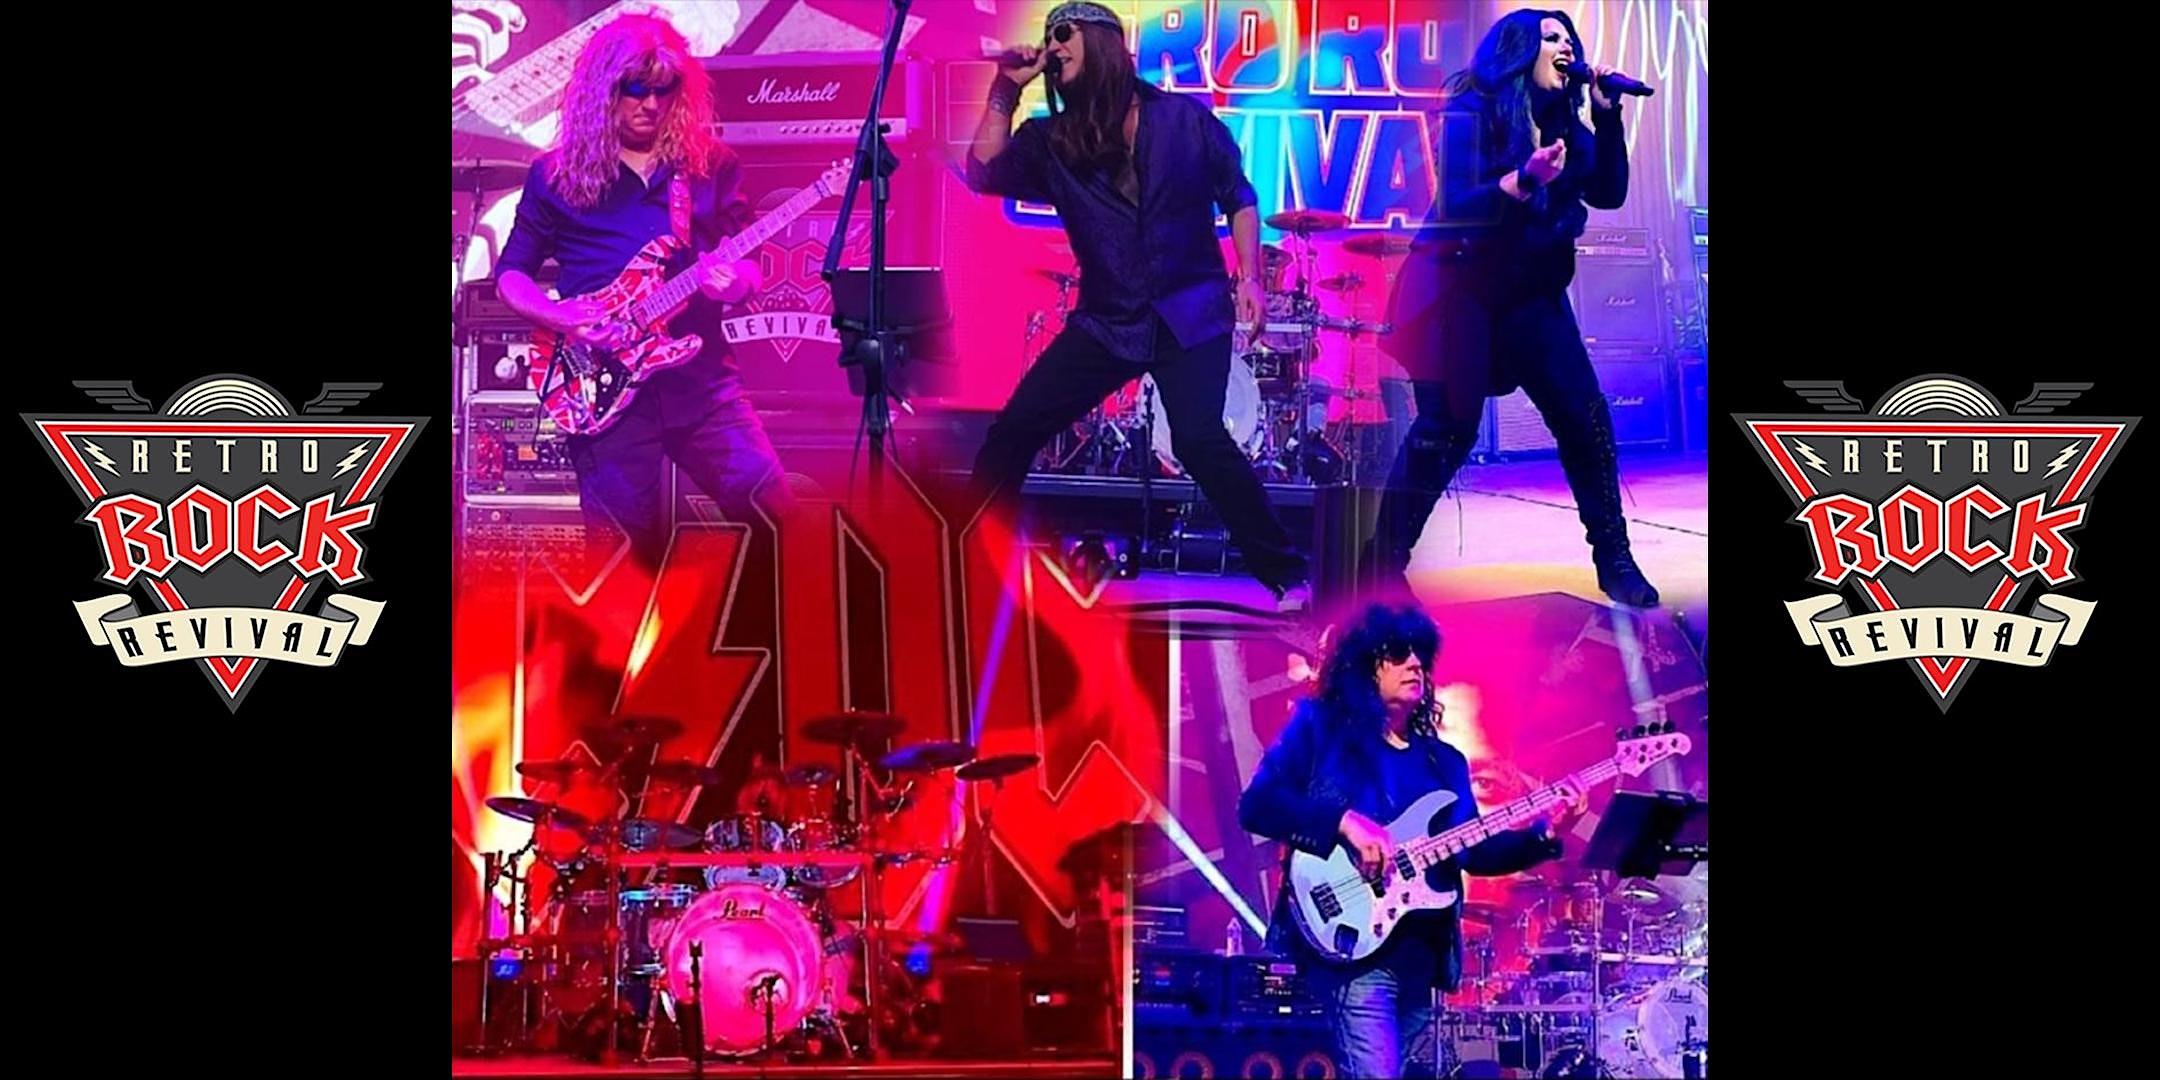 Retro Rock Revival – A Tribute to 80's Arena Rock!